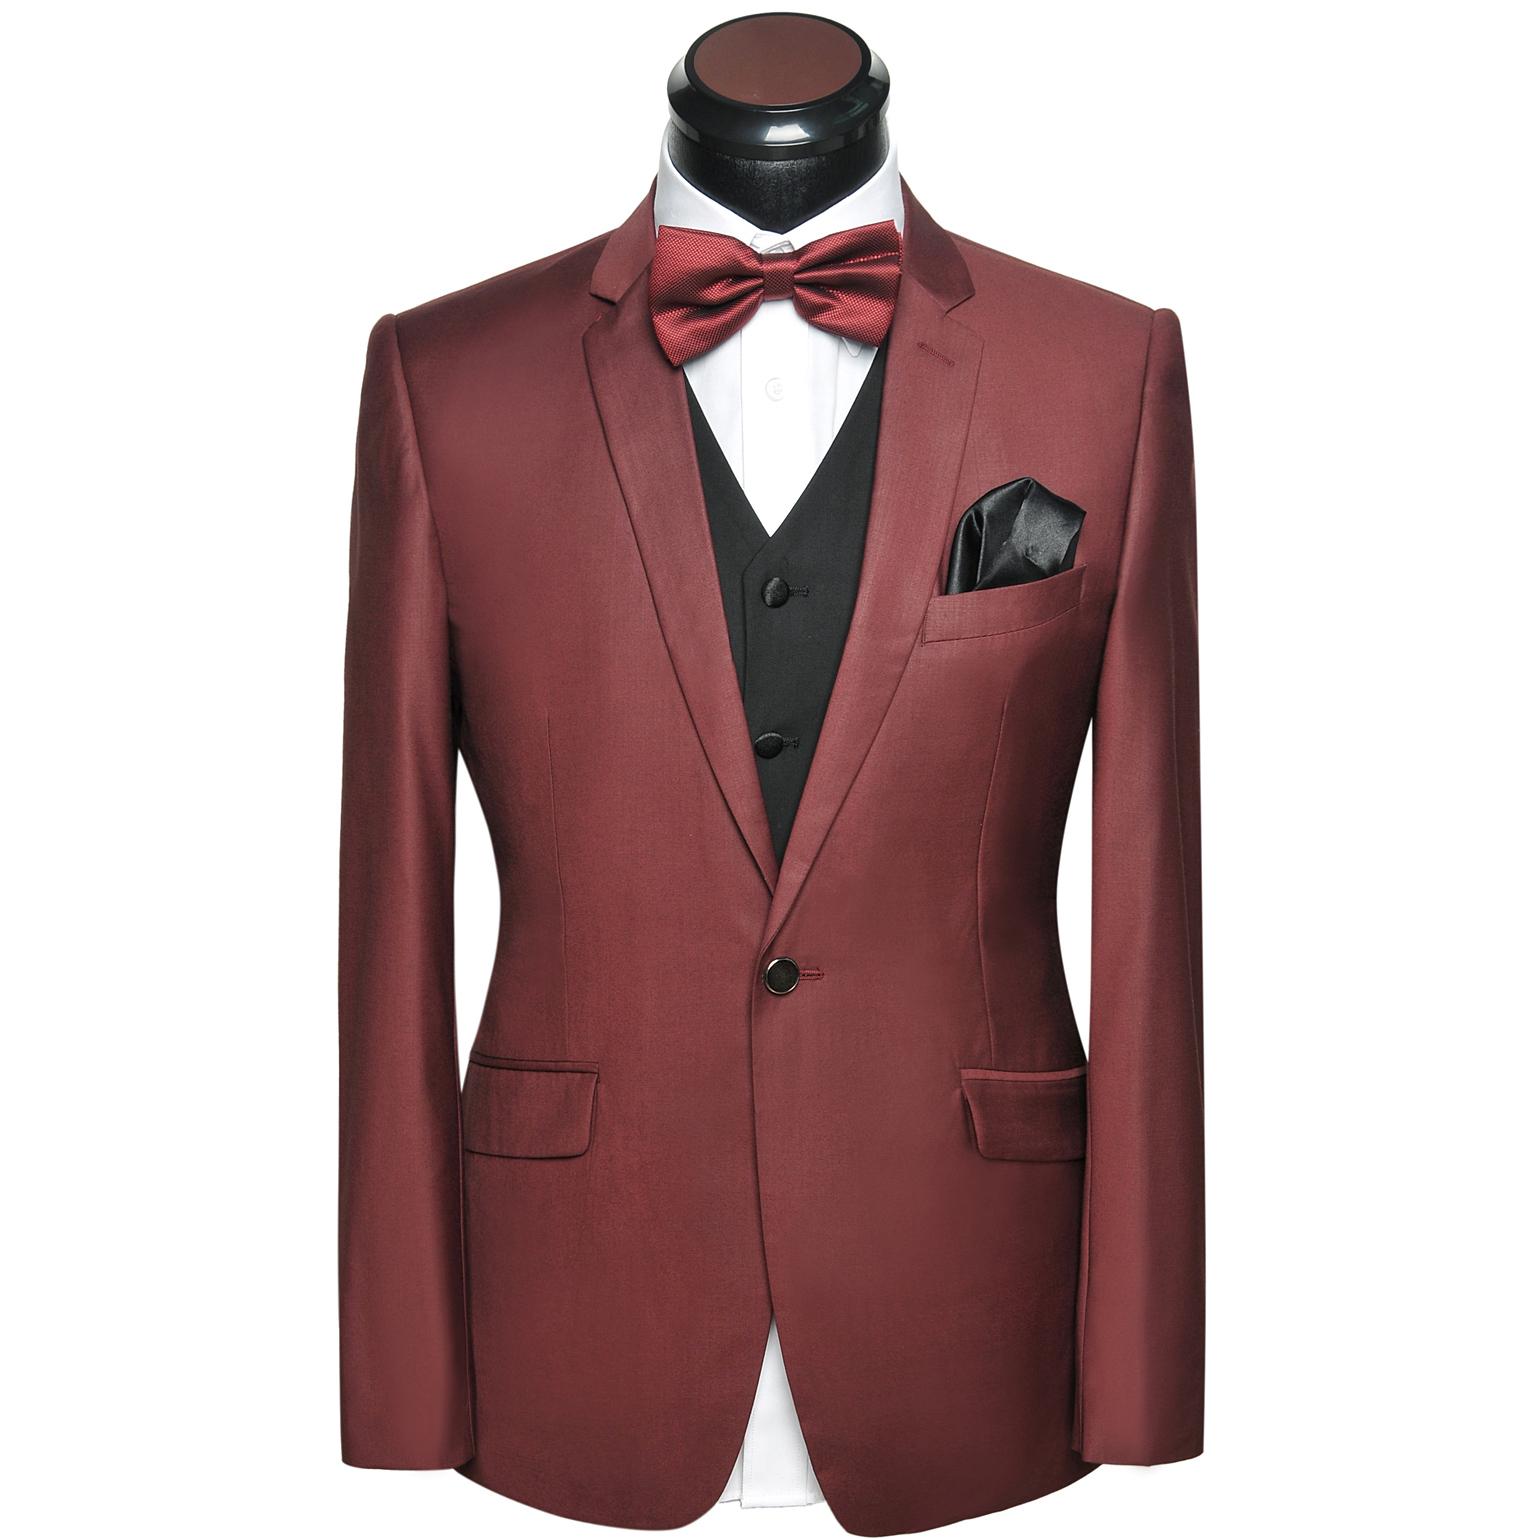 Vintage Tuxedo Tails Promotion-Shop for Promotional ...